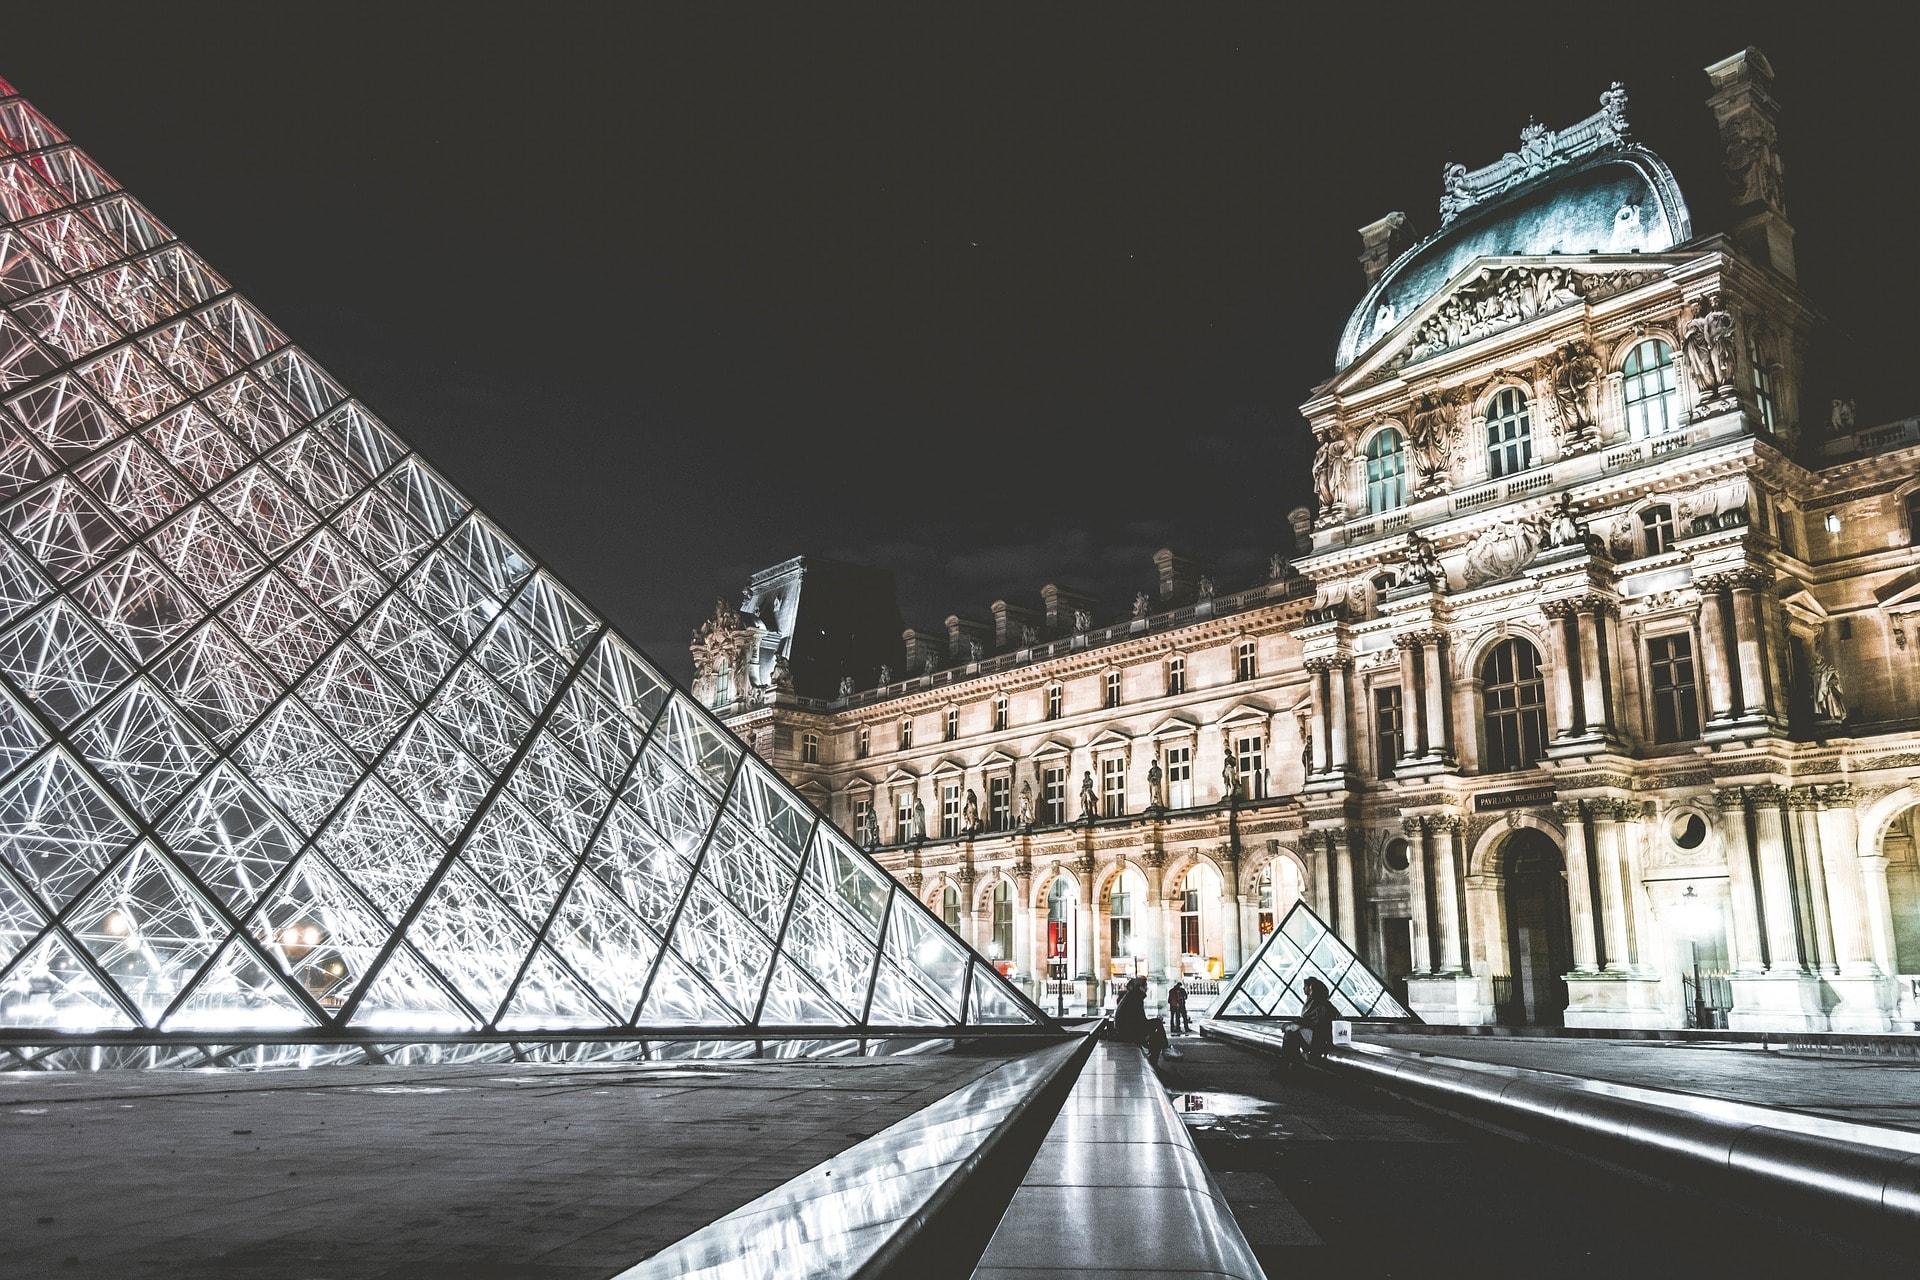 The Musée du Louvre's Collections